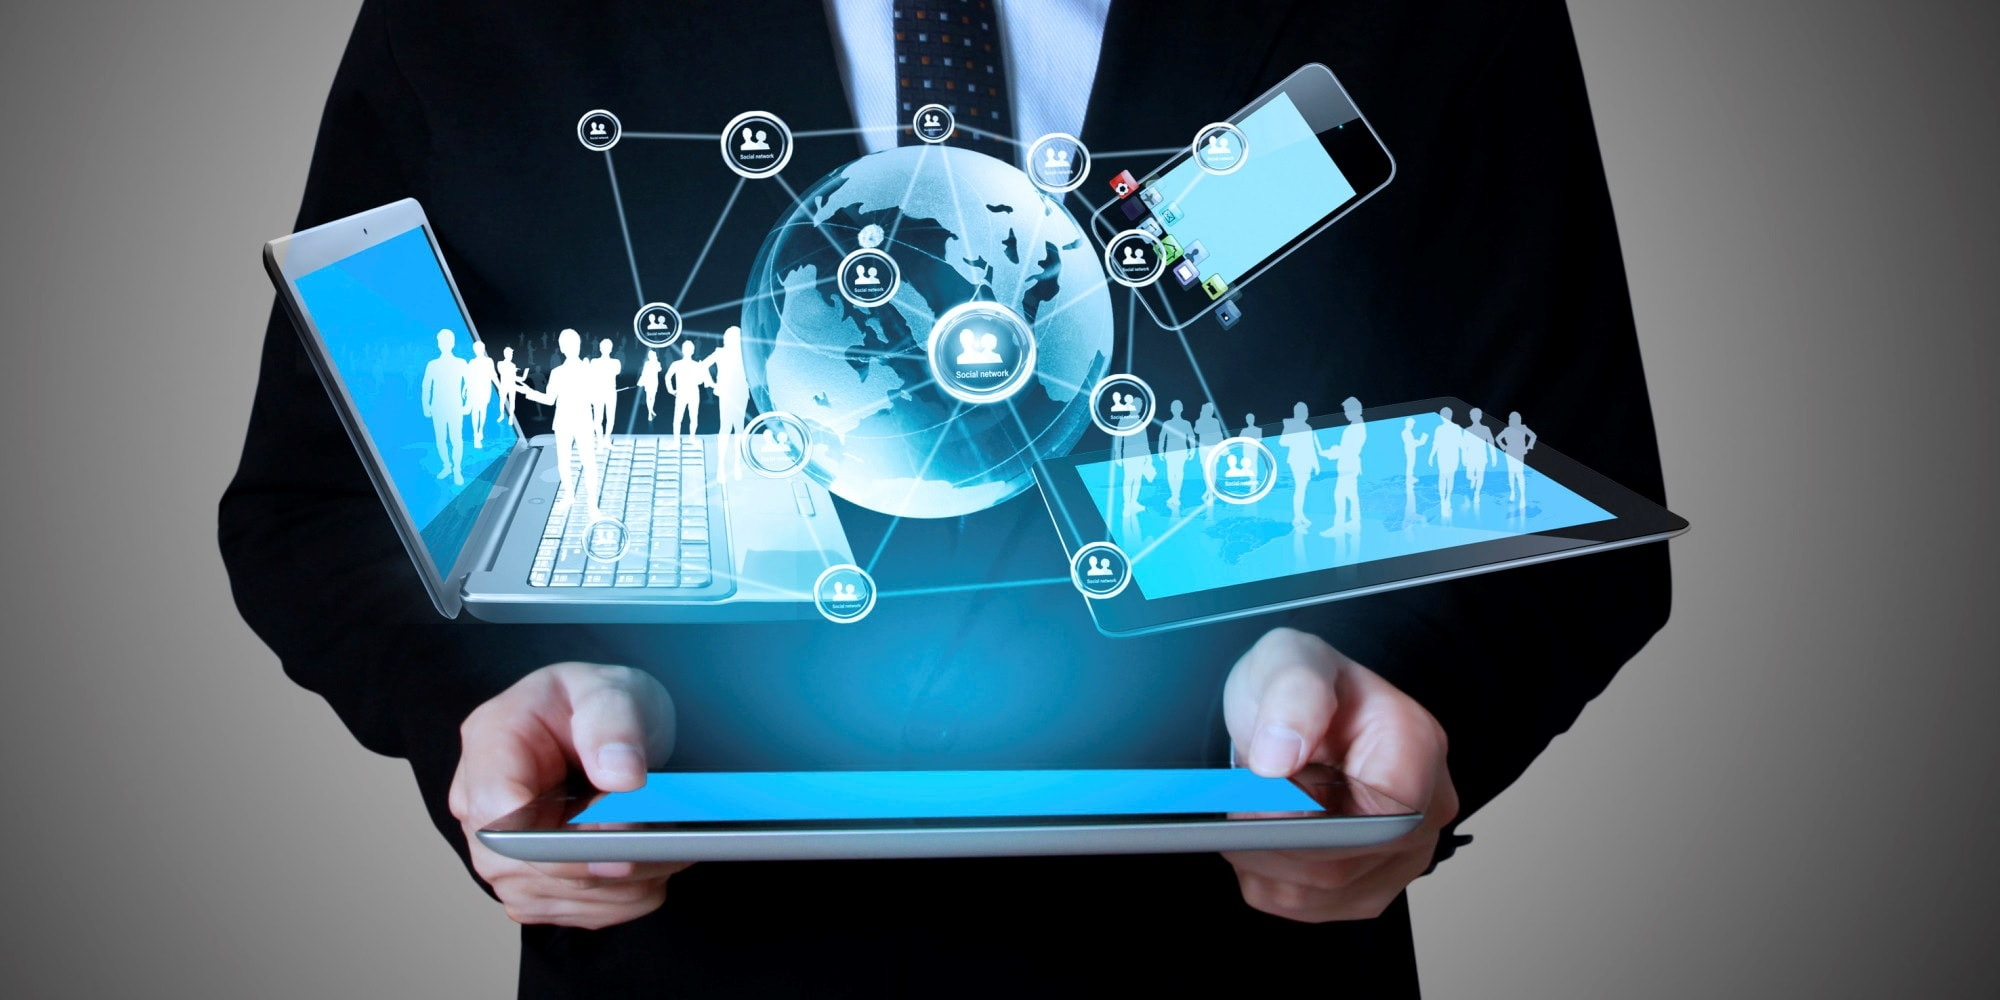 L'industrie du futur sera une industrie de service